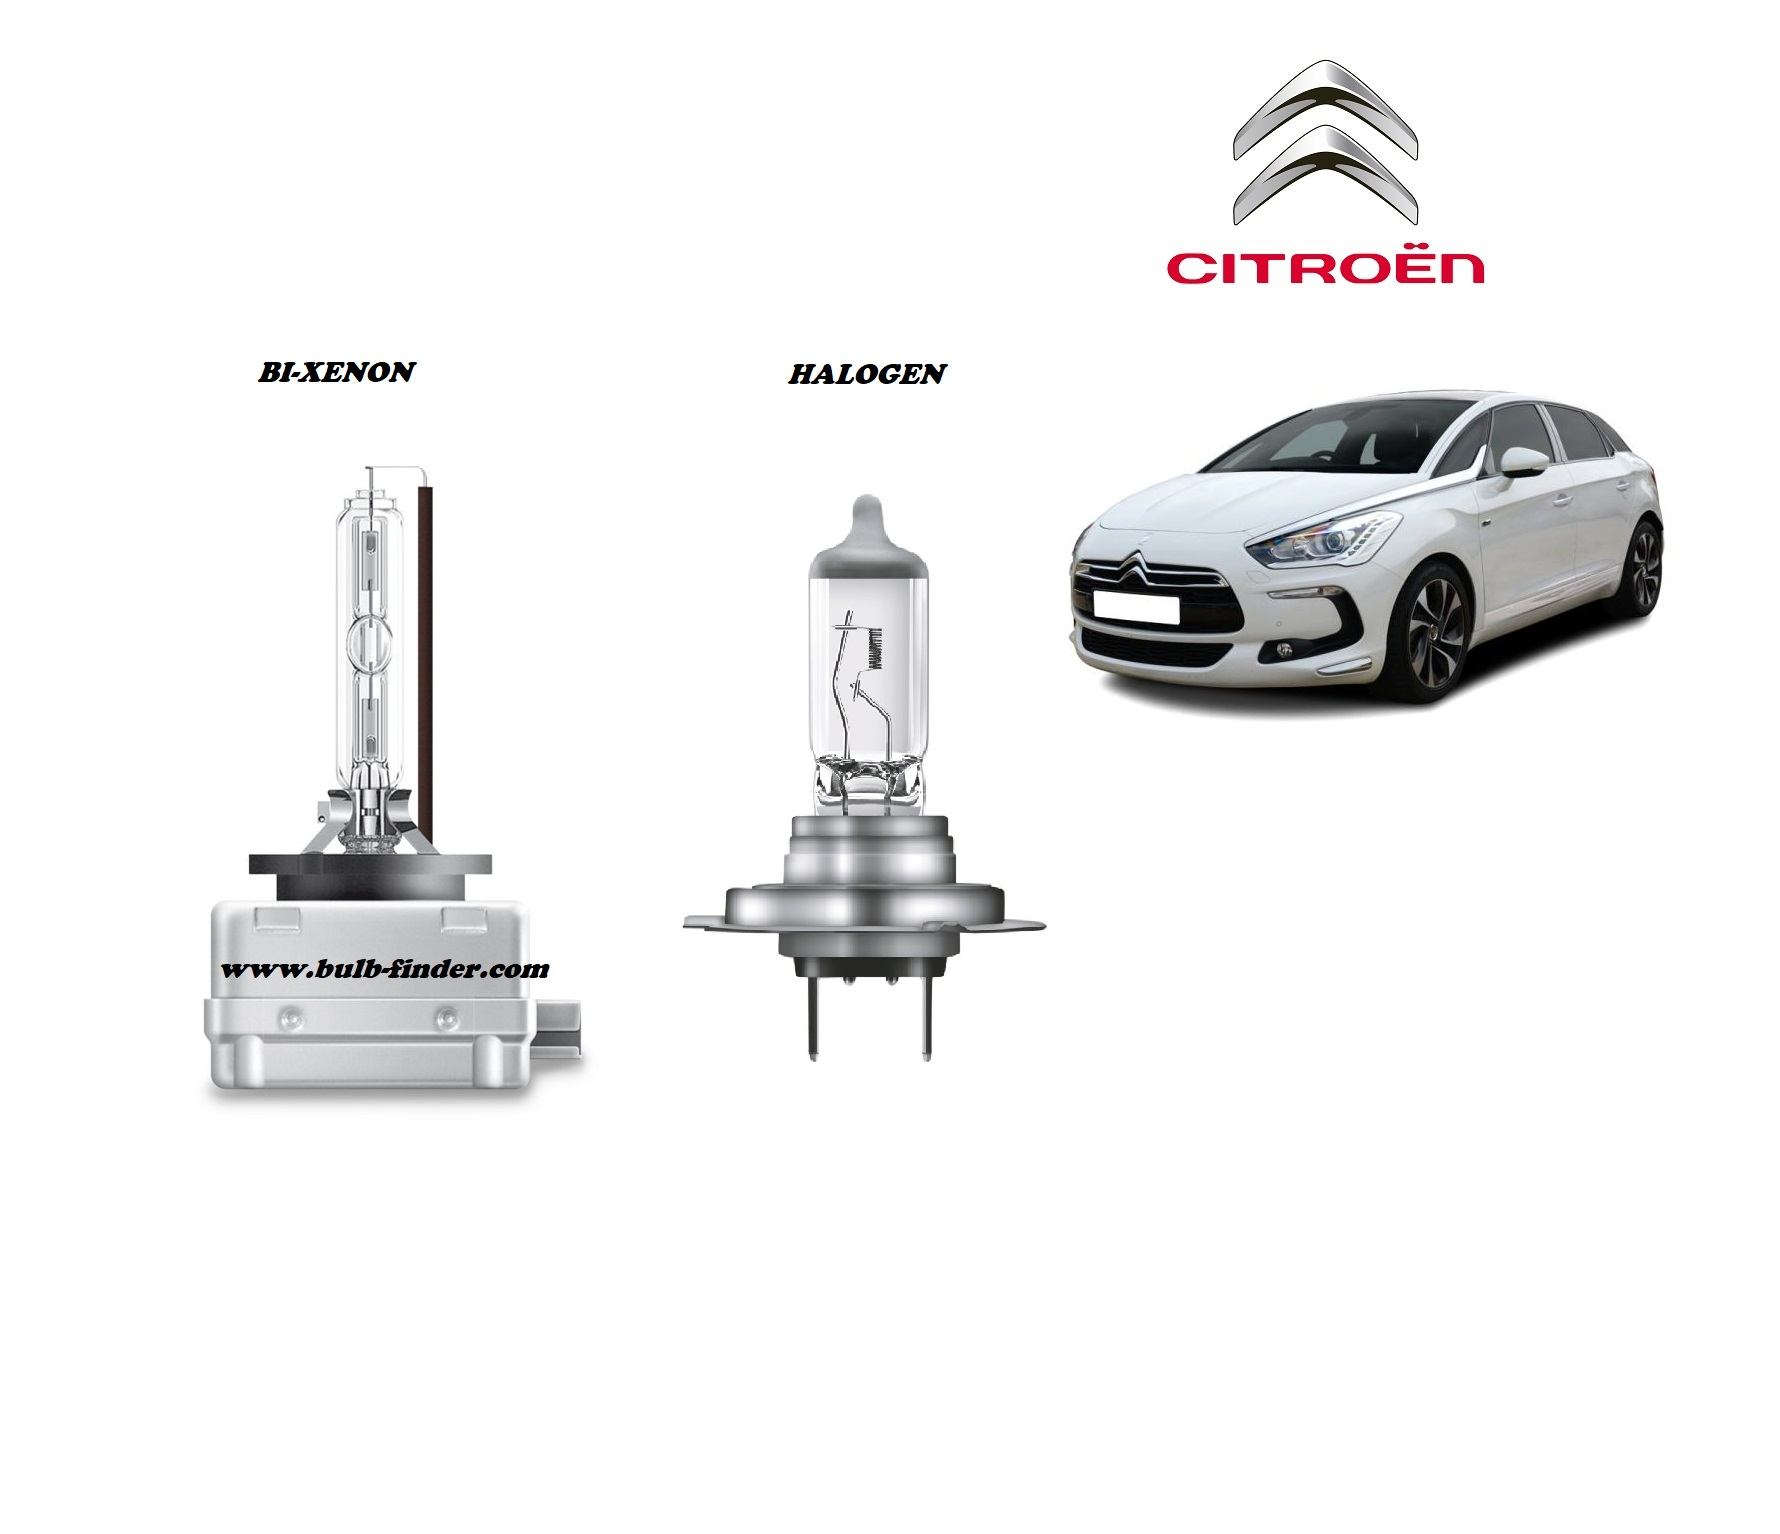 Citroen DS5 bulb type LOW BEAM HEADLIGHT